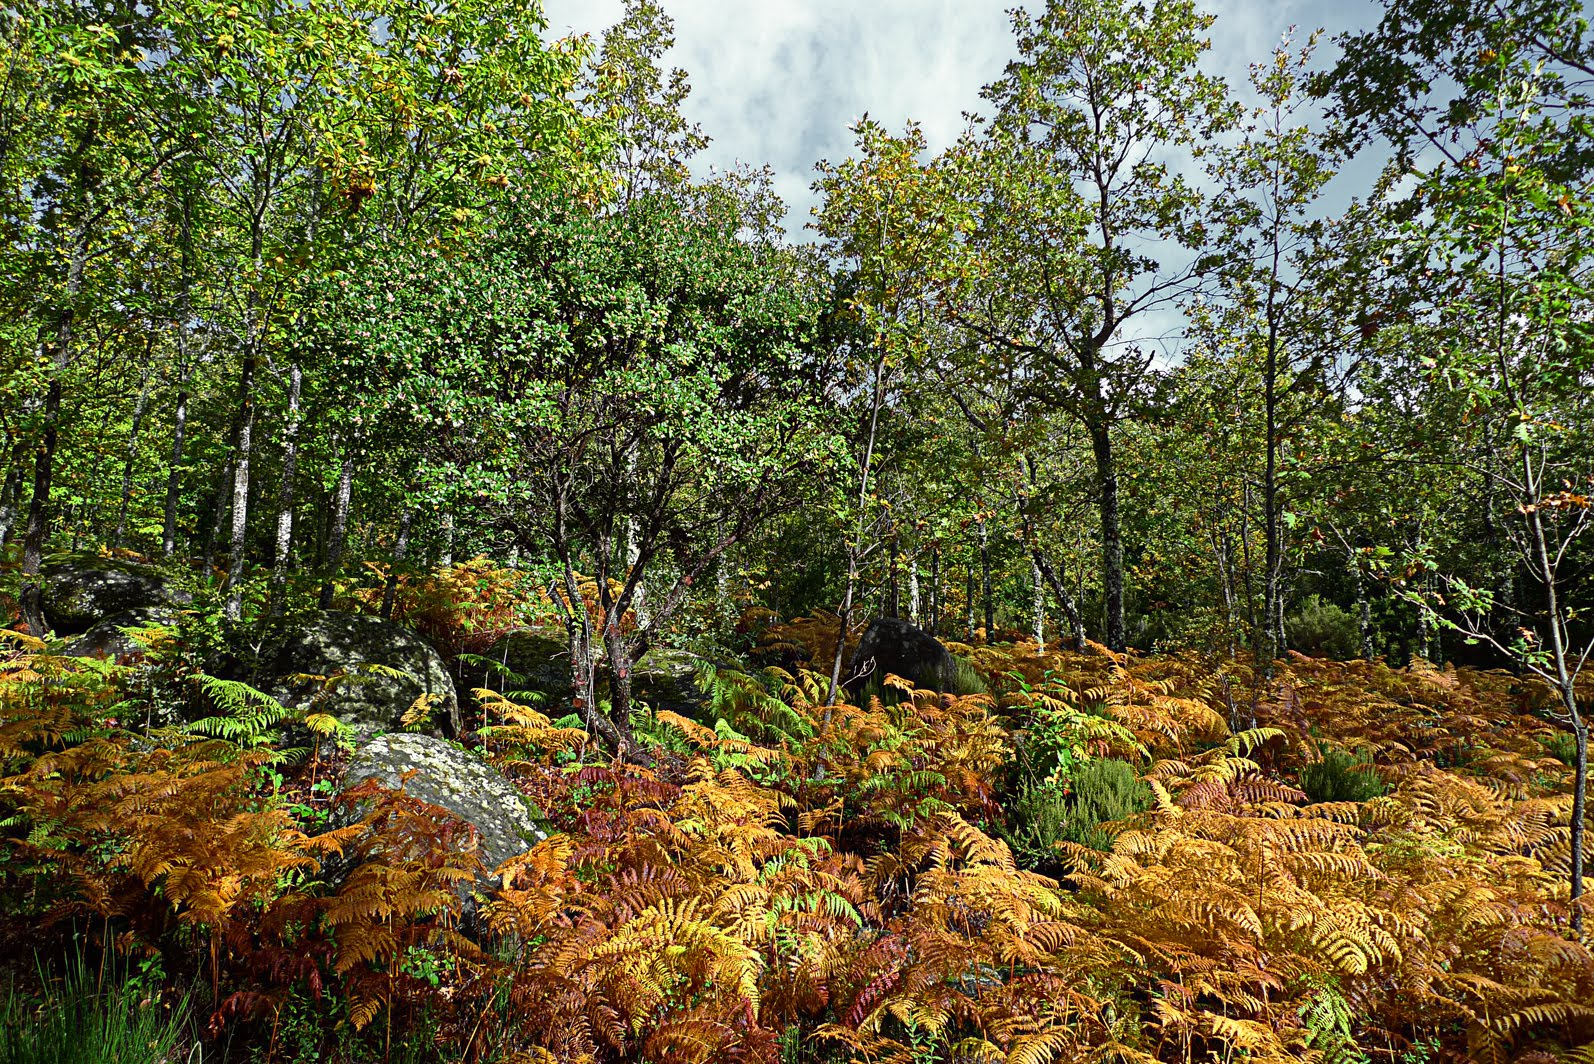 Valle de valverde lgf rboles de hoja caduca for Arboles jardin hoja perenne